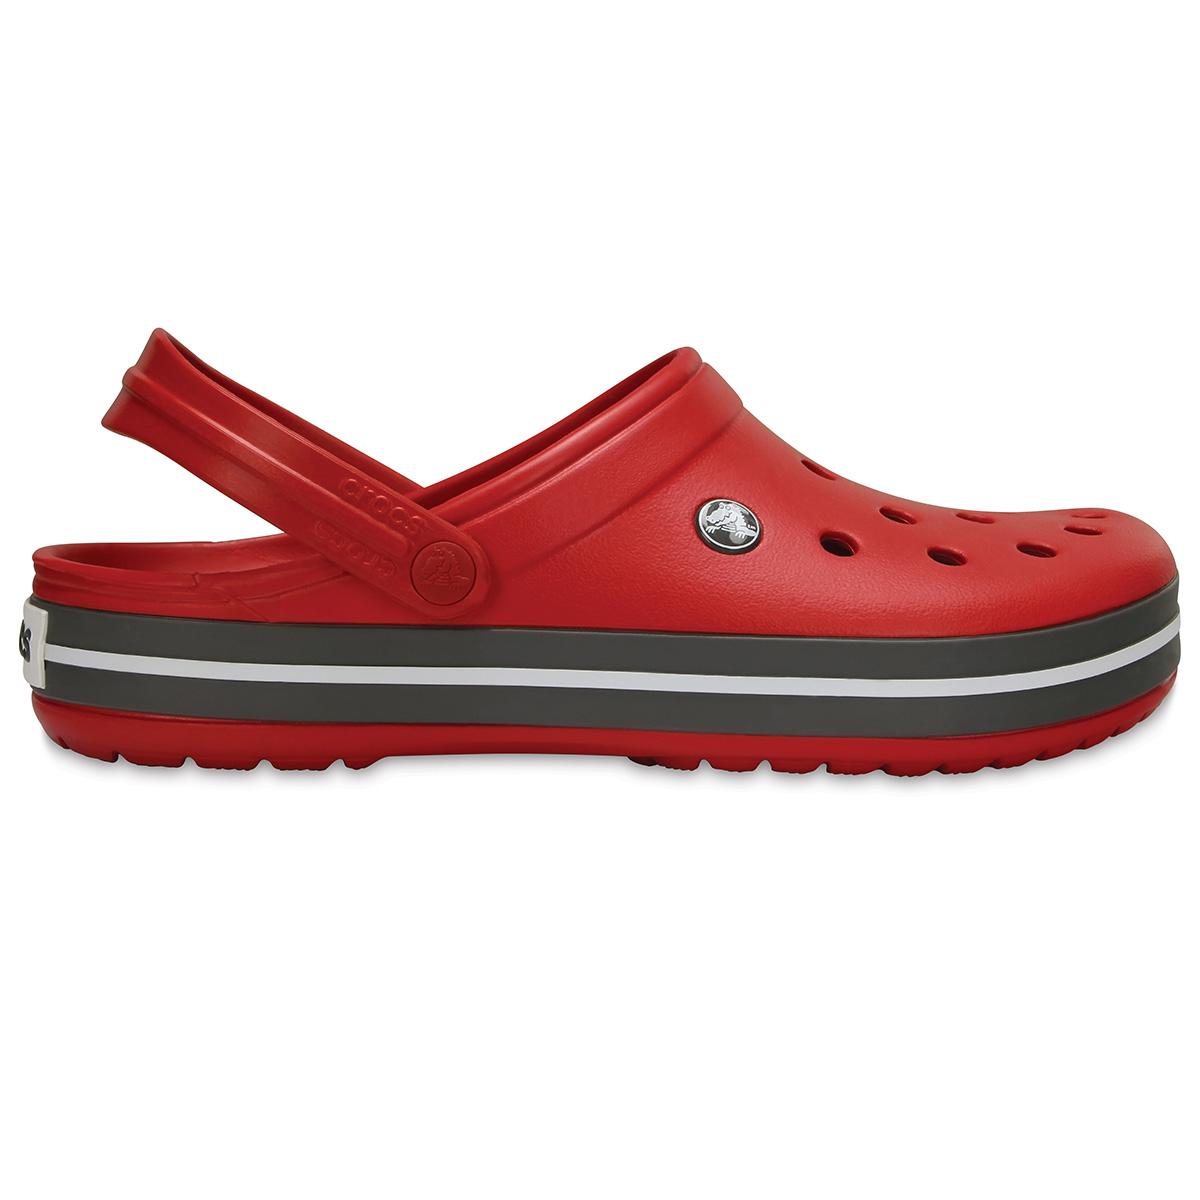 Crocs Crocband - Biber